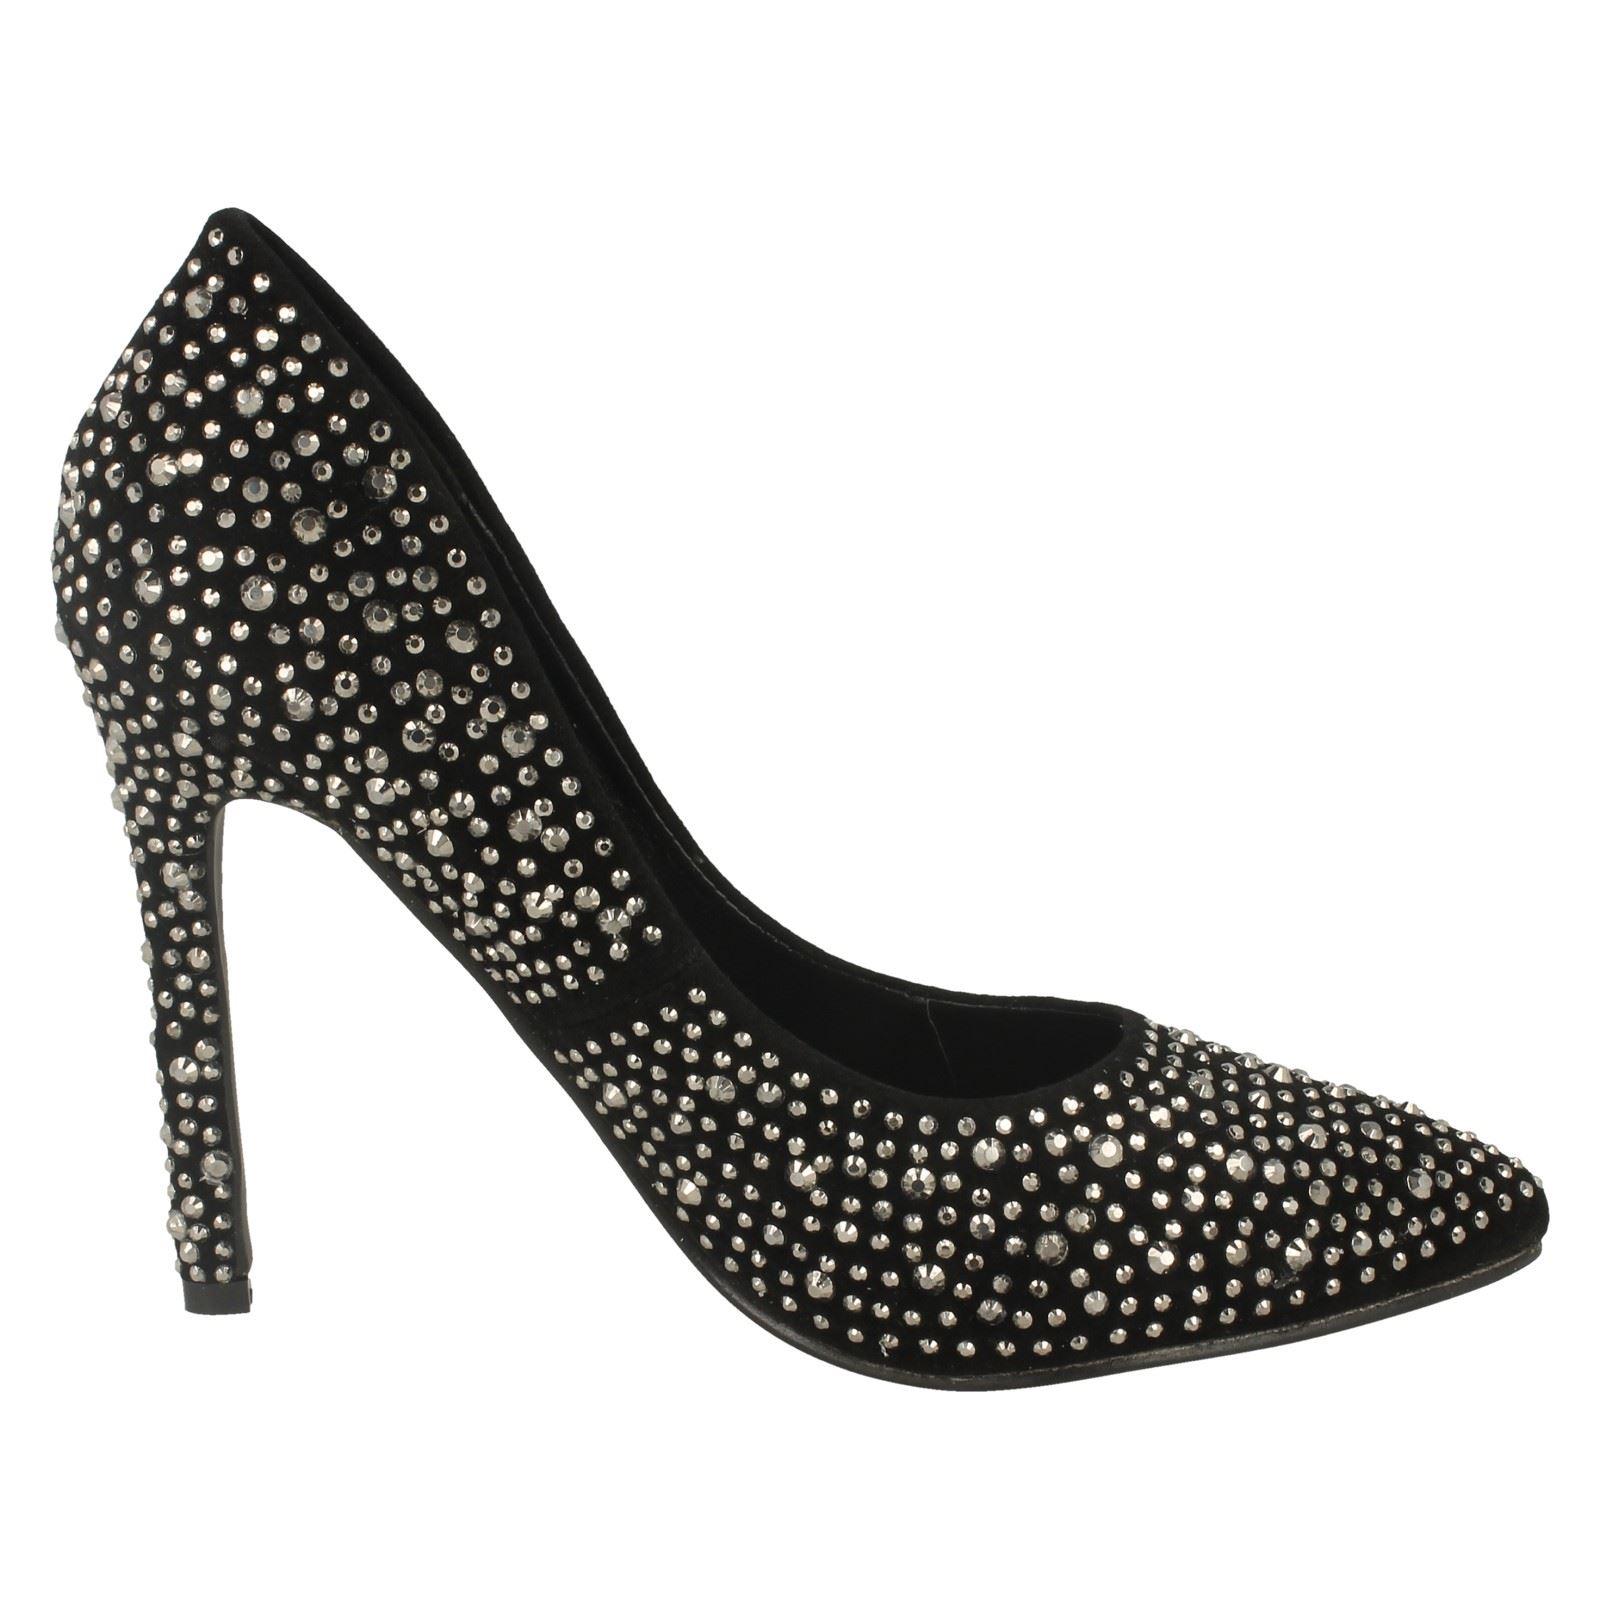 Anne Michelle Ladies Polka Dot Court Shoes